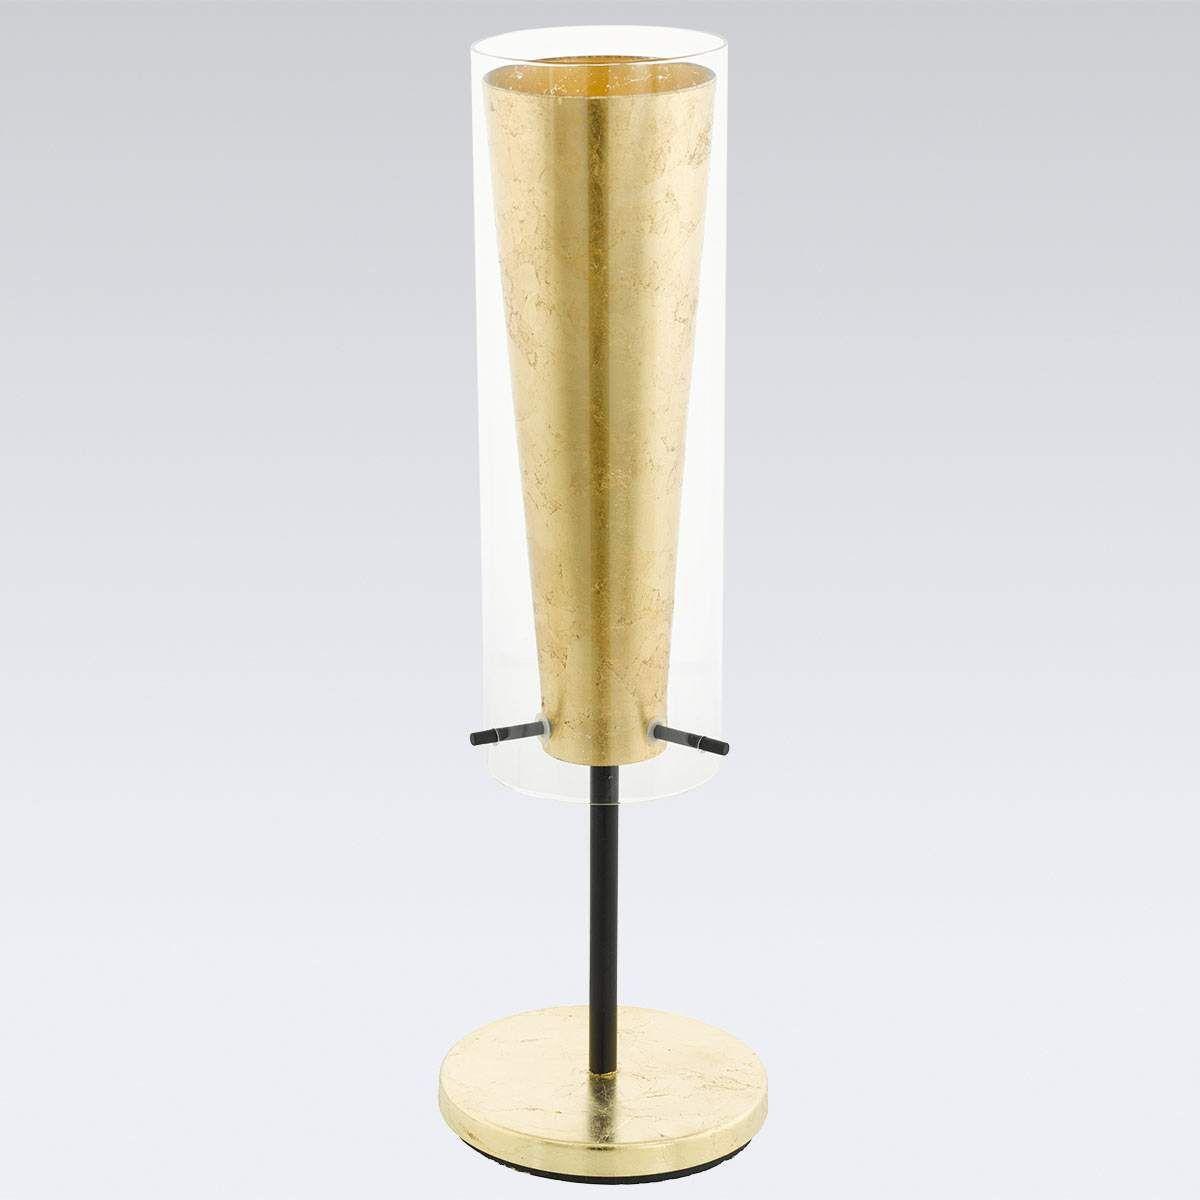 schlafzimmer lampe kugel  led tischlampe  esstischlampe